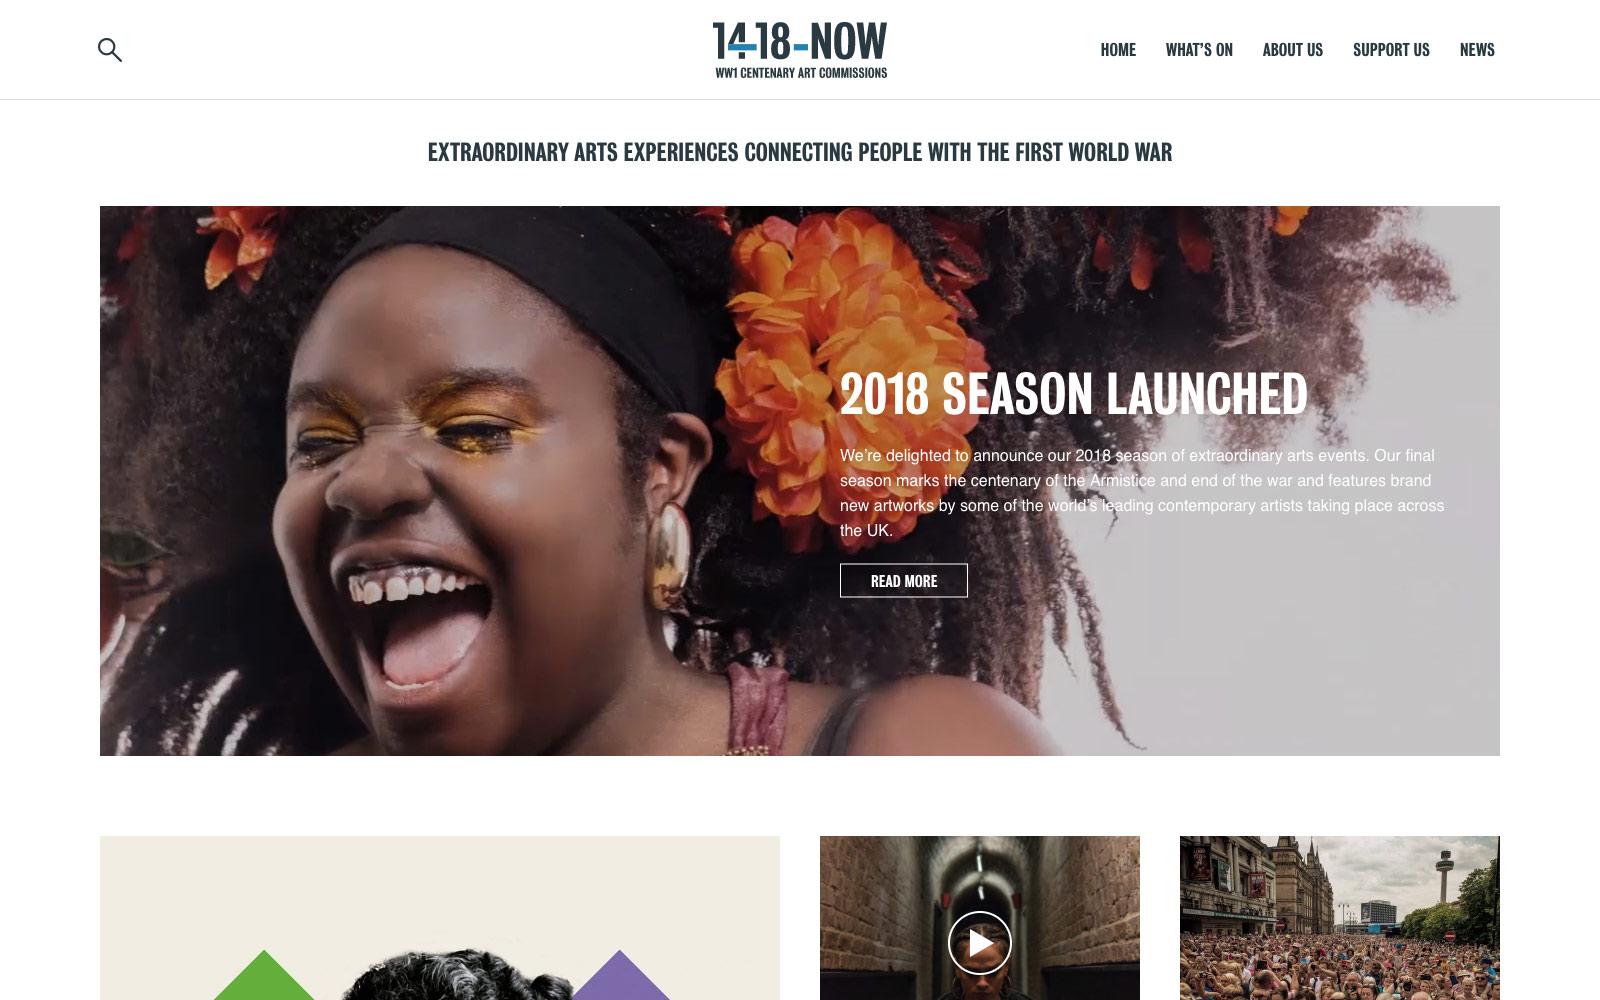 14-18 NOW website homepage